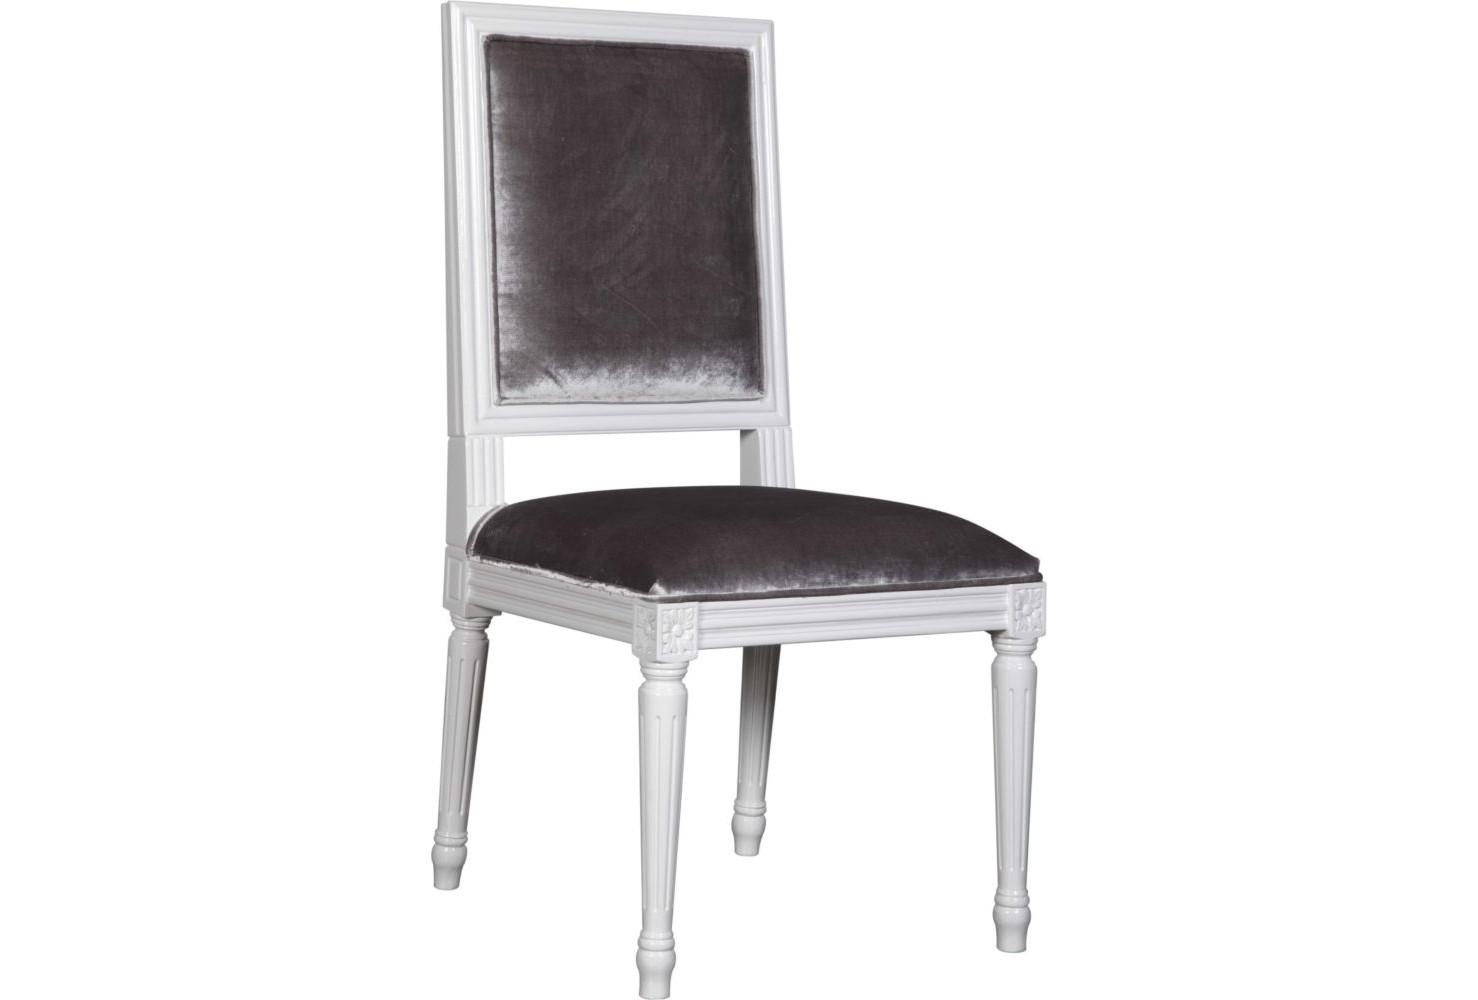 Кухонный стул M-Style 15436583 от thefurnish